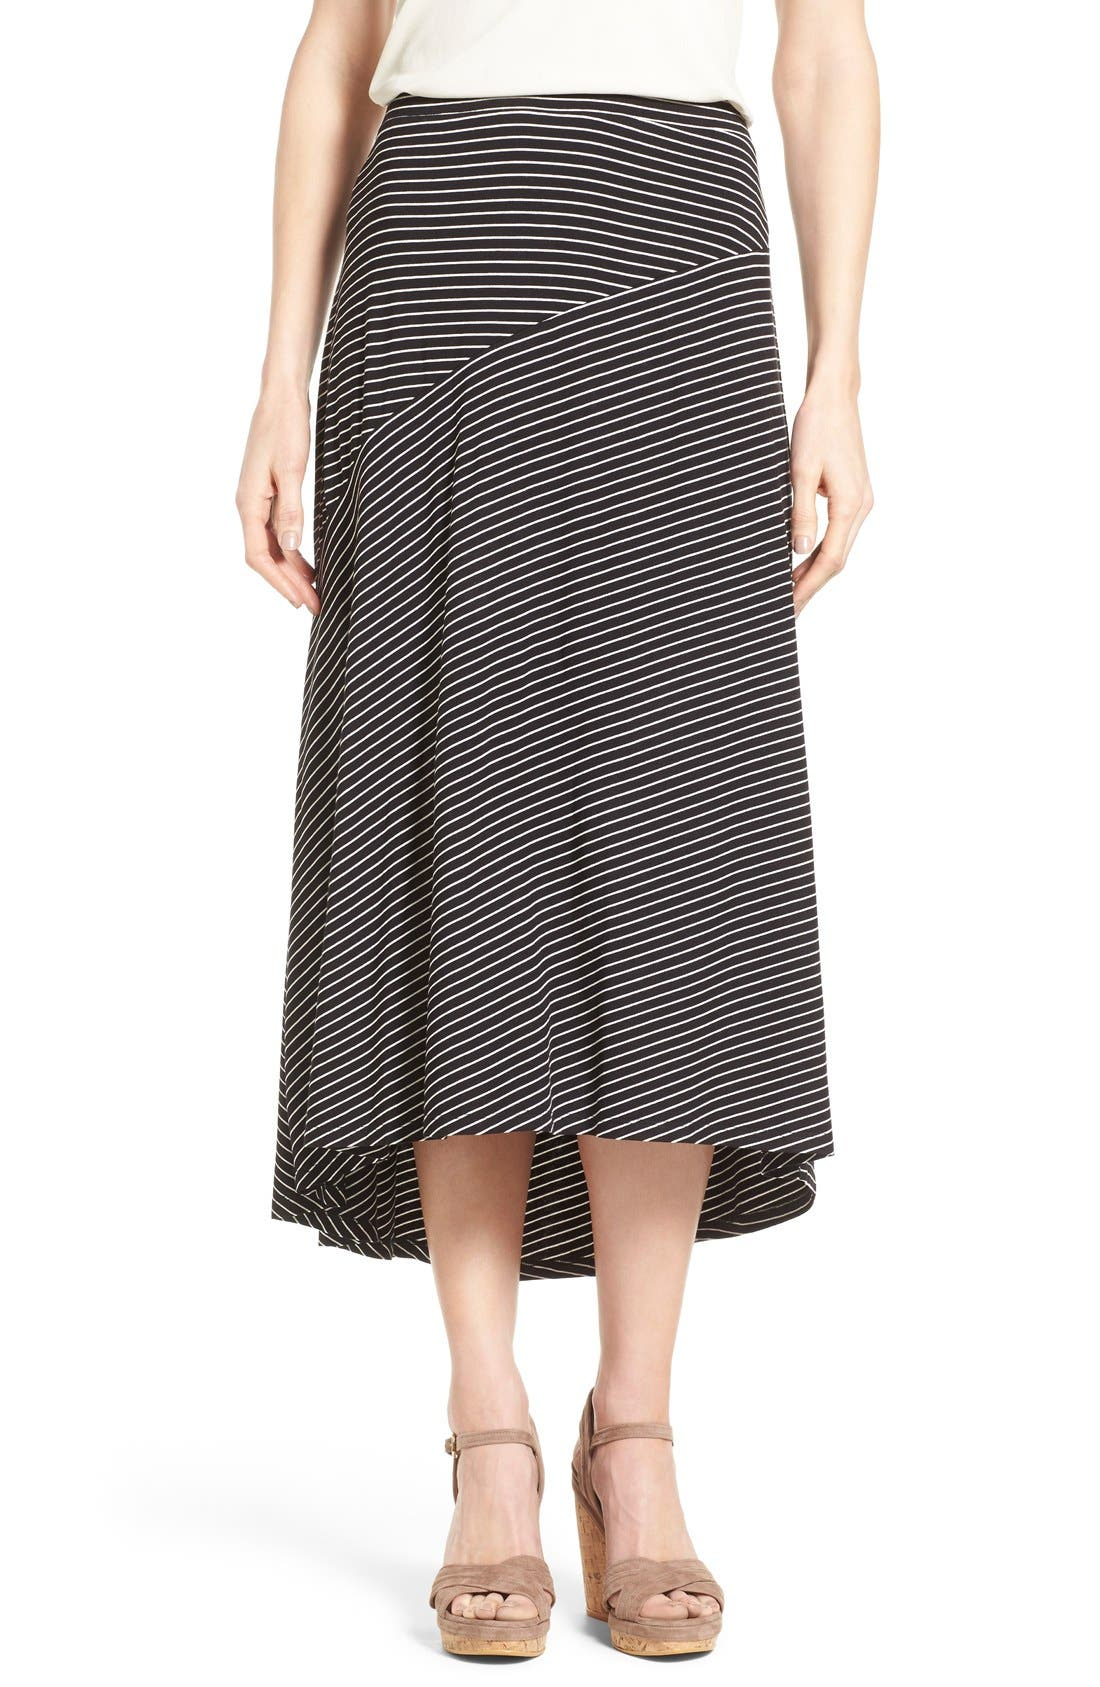 Alternate Image 1 Selected - Chaus 'Pool Stripe' Asymmetrical Maxi Skirt